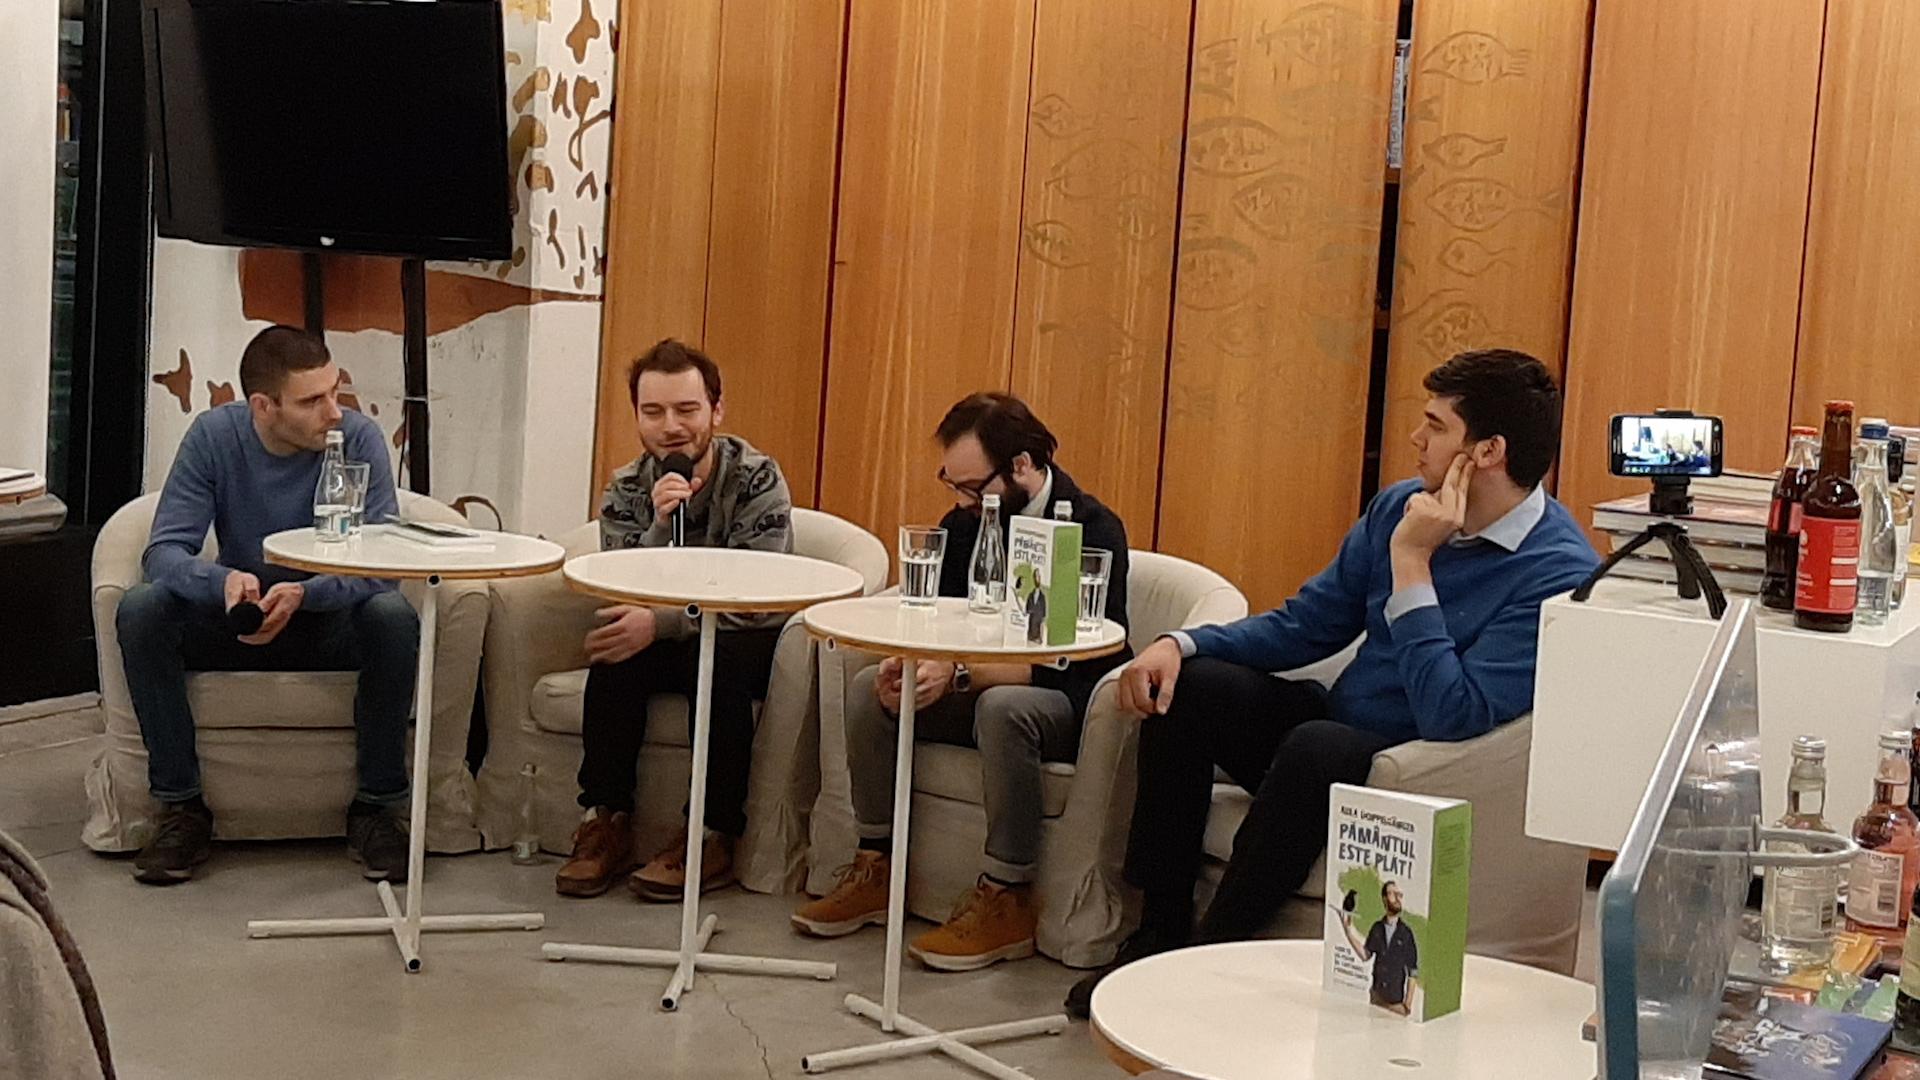 Instantaneu de la lansarea cărții, la Humanitas Cișmigiu